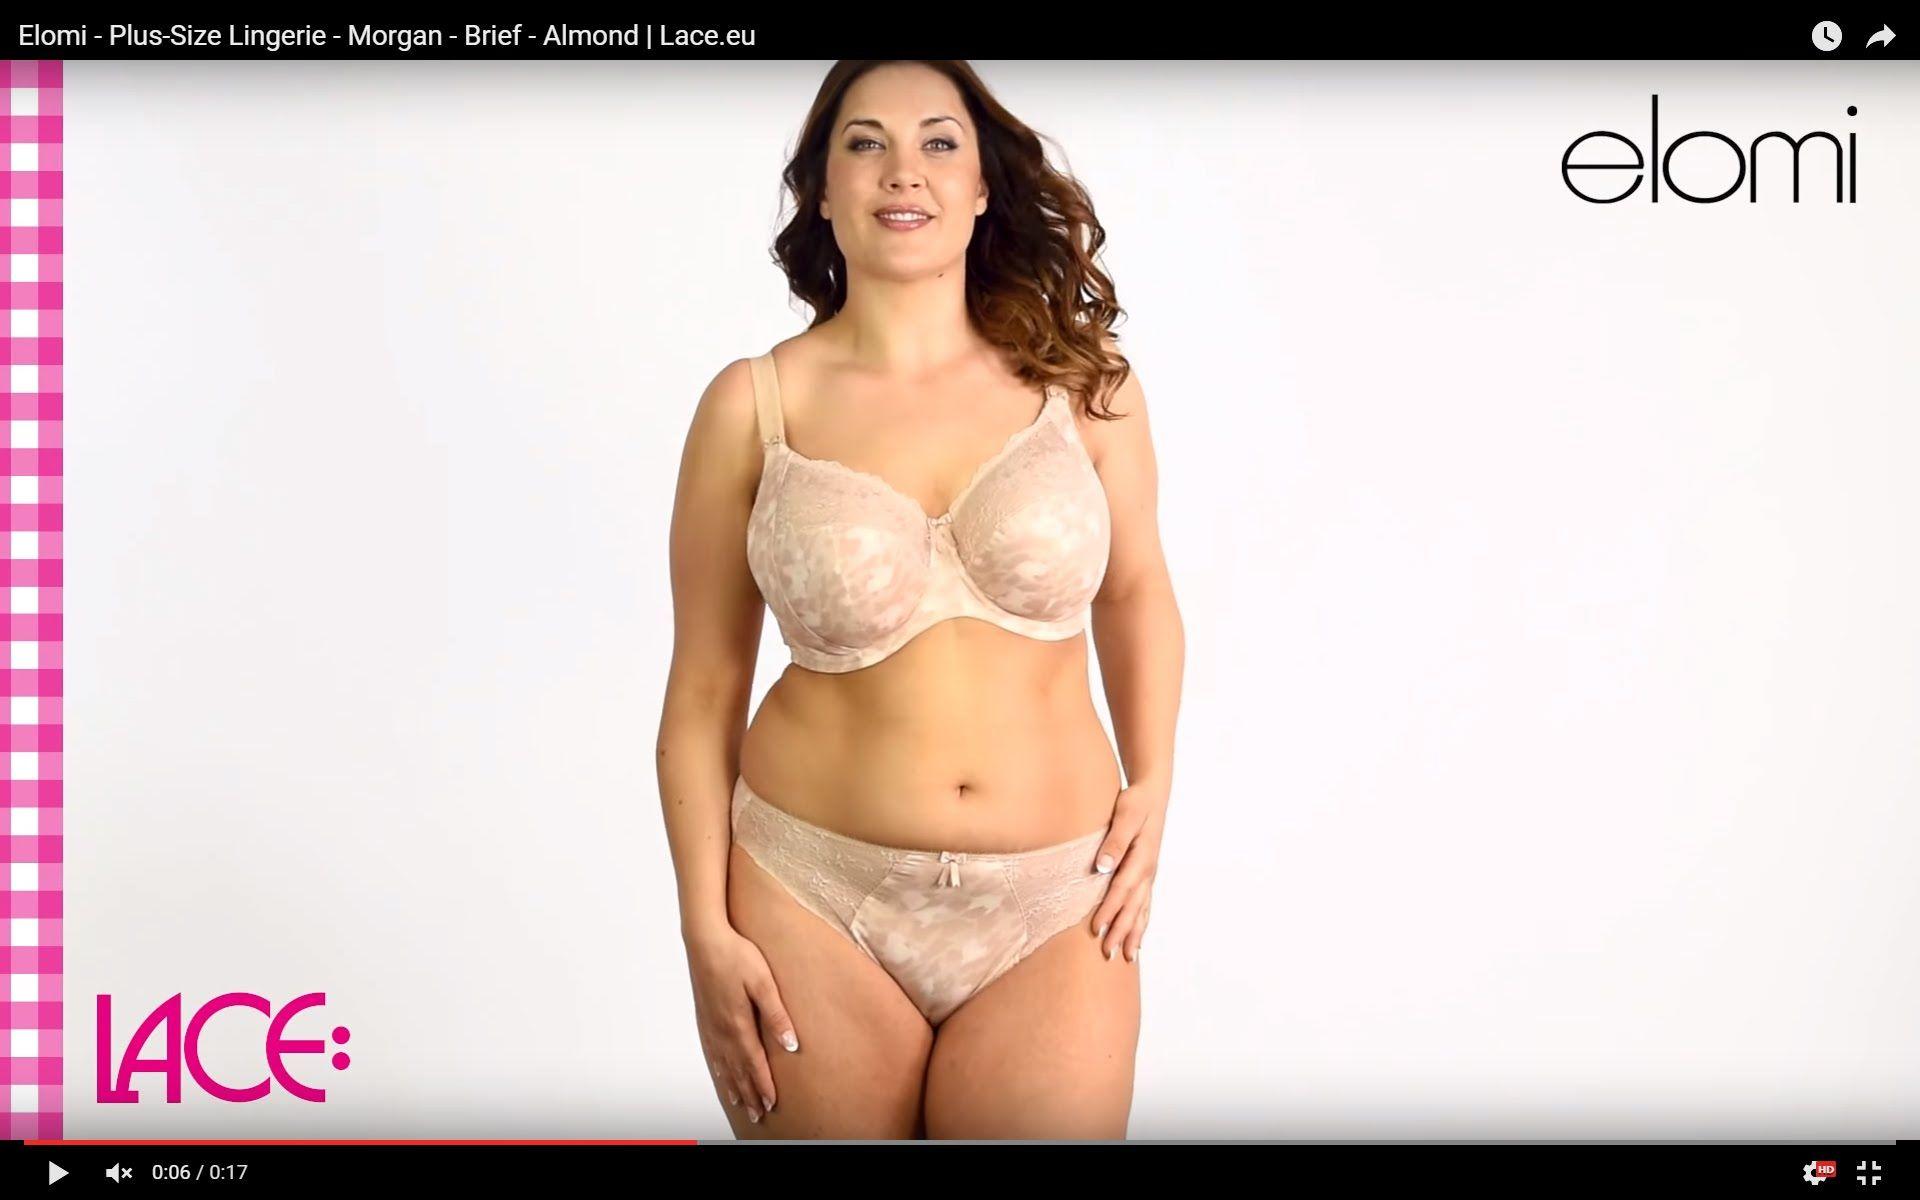 a1f5fc01728 Elomi plus size lingerie morgan bra brief almond lace jpg 1920x1200 Elomi  full figure models wallpaper